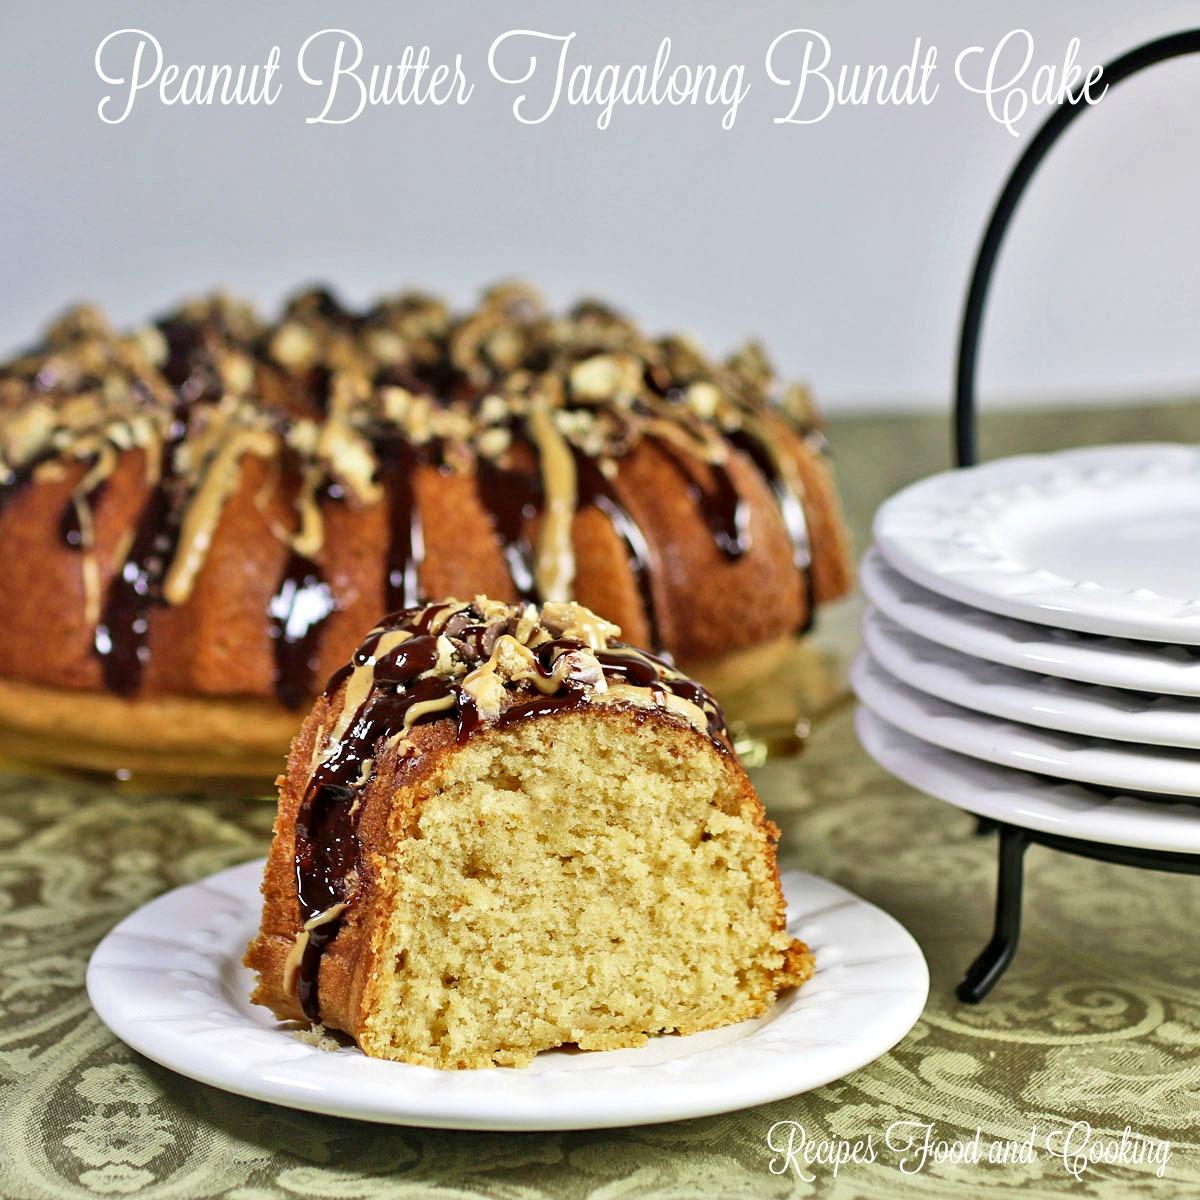 Peanut Butter Tagalong Bundt Cake